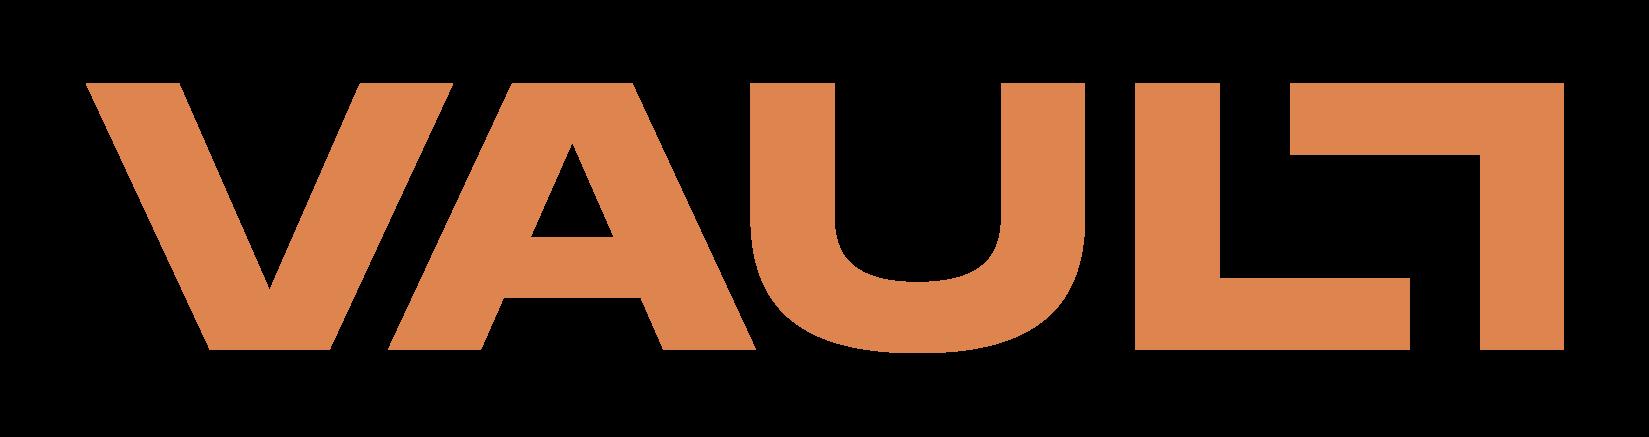 Vault Workwear